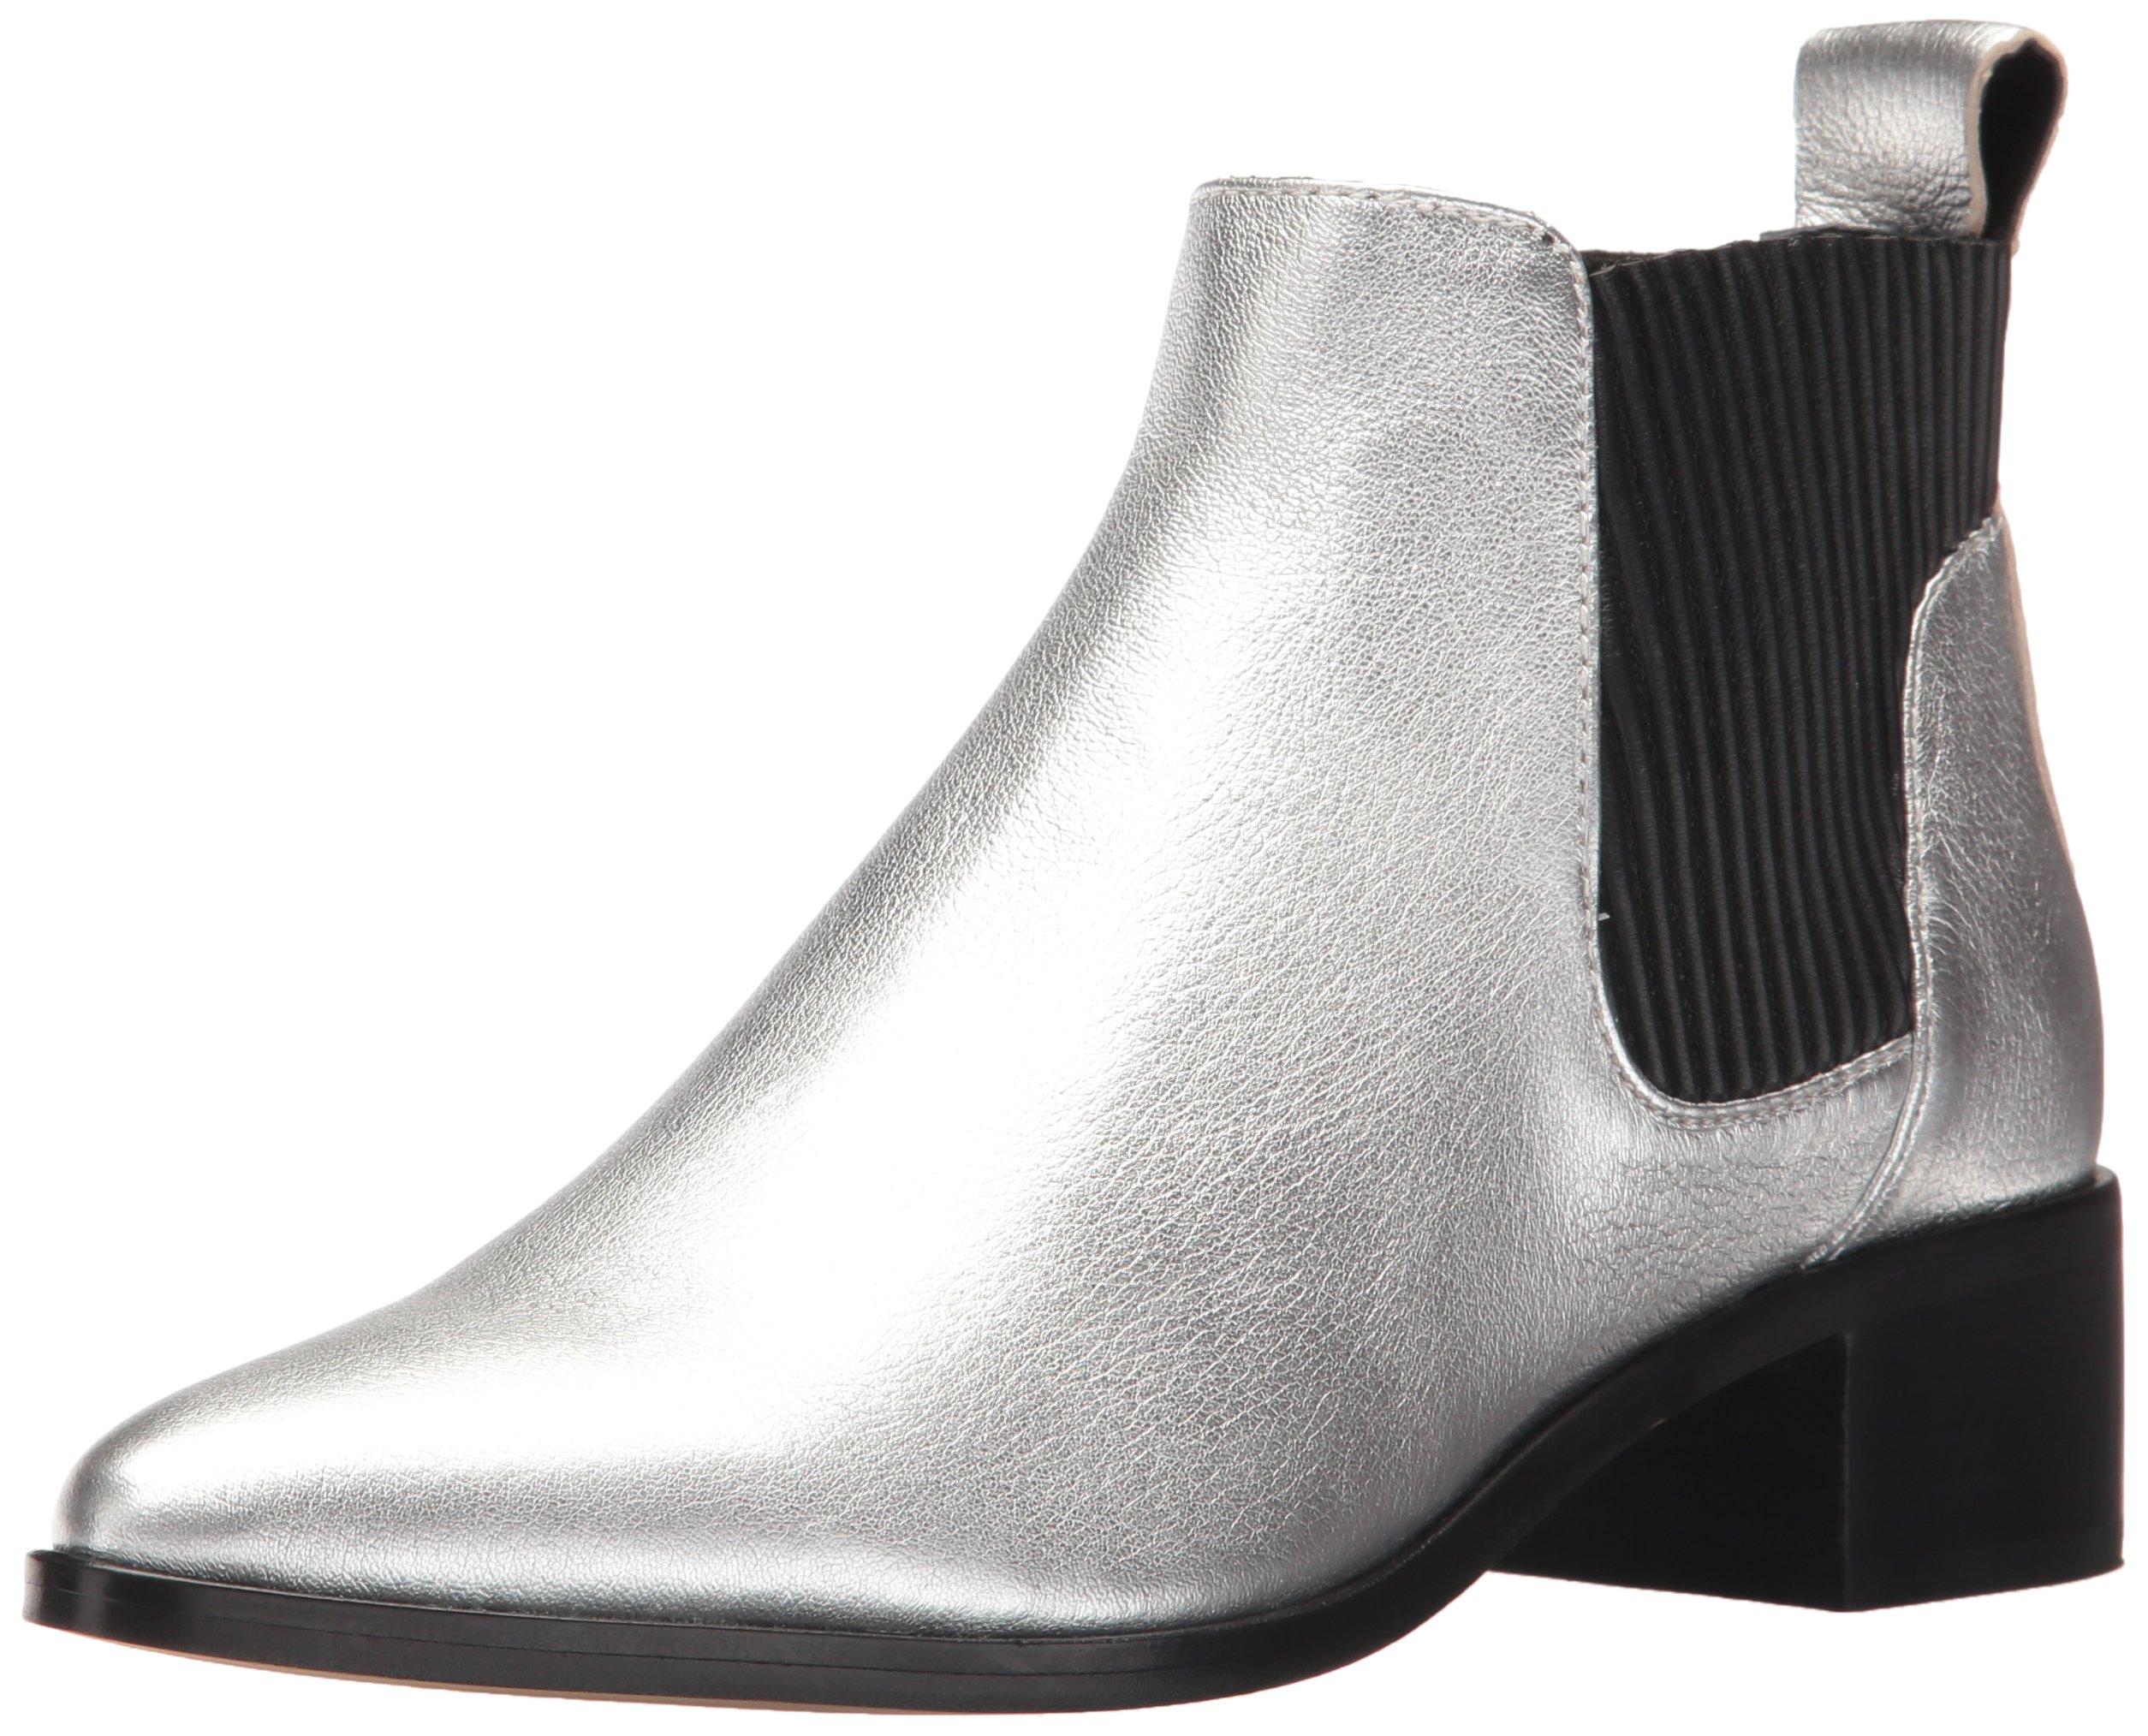 Dolce Vita Women's Macie Fashion Boot, Silver Leather, 7.5 Medium US